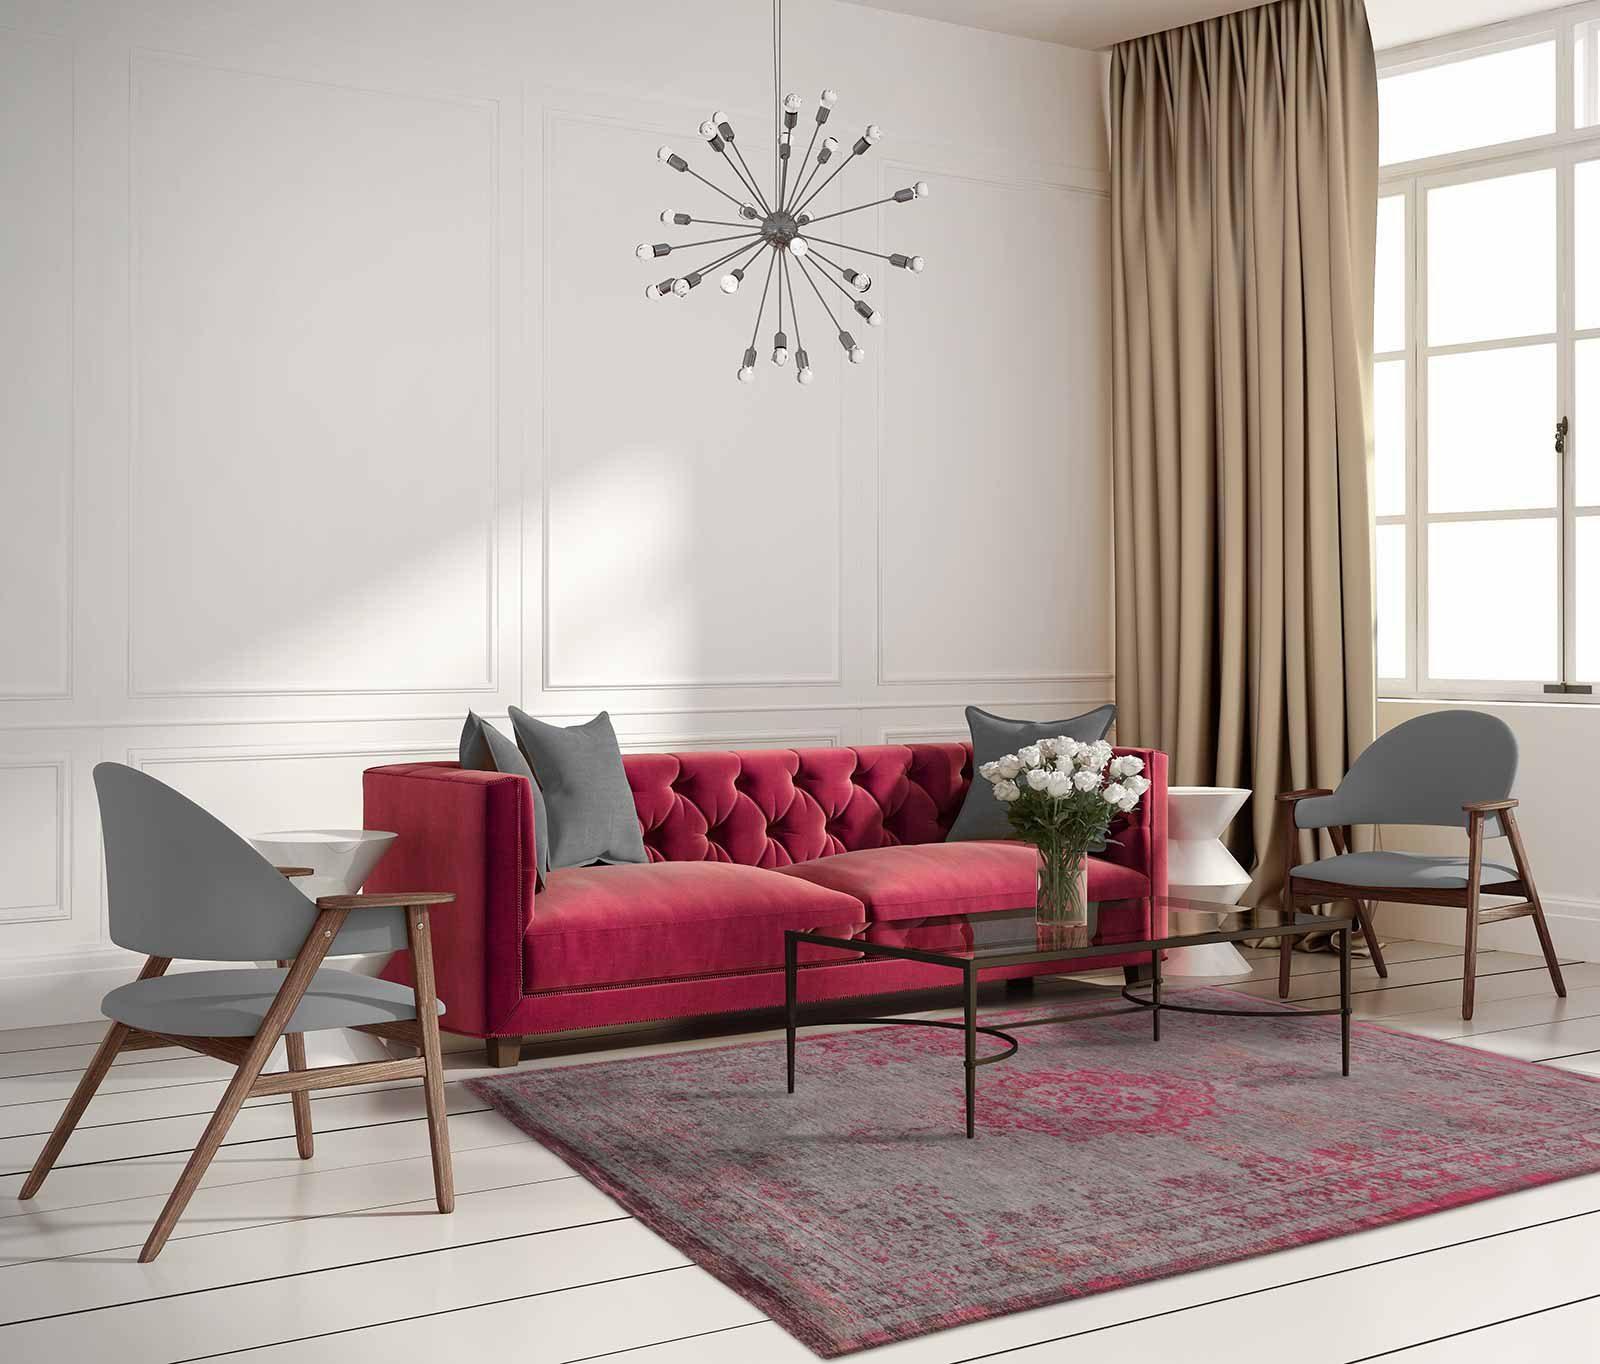 tapijt Louis De Poortere LX8261 Fading World Medaillon Pink Flash interior 2